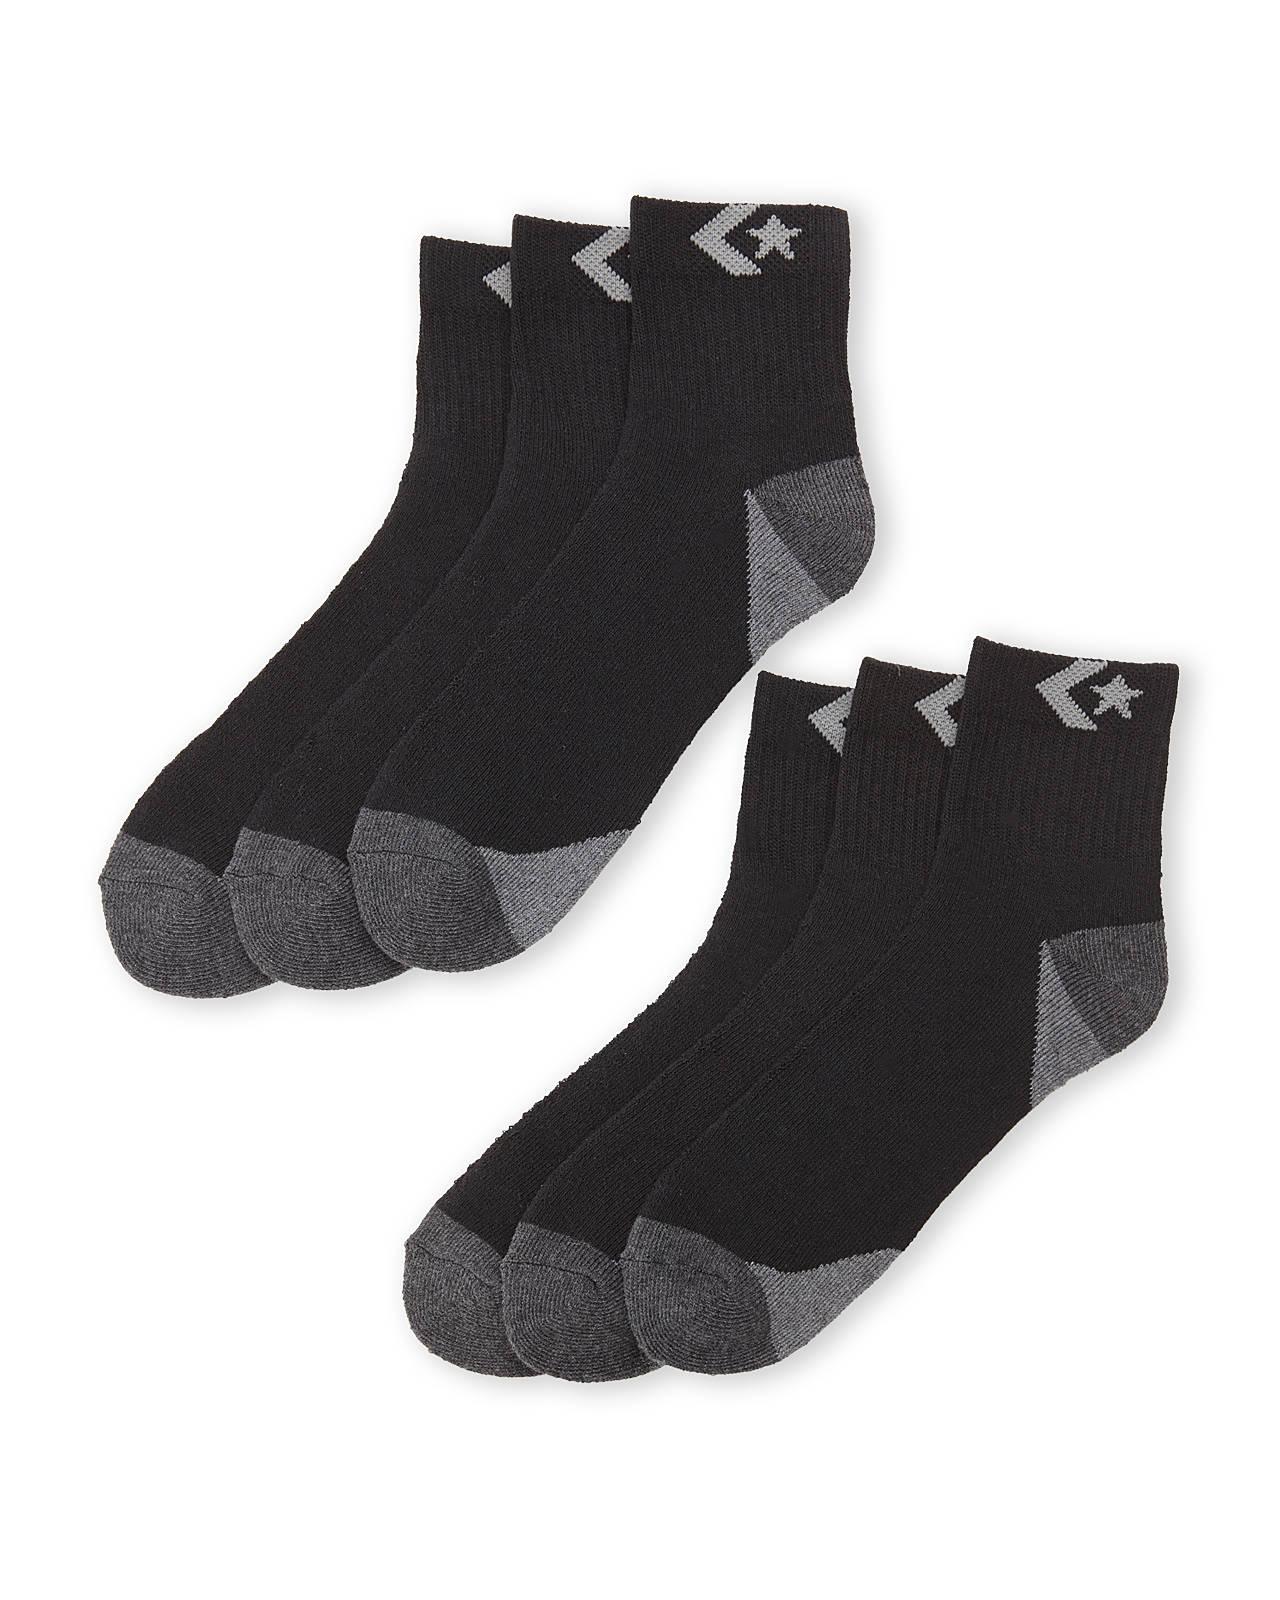 d8a604ede619 Lyst - Converse 6-Pack Quarter Socks in Black for Men